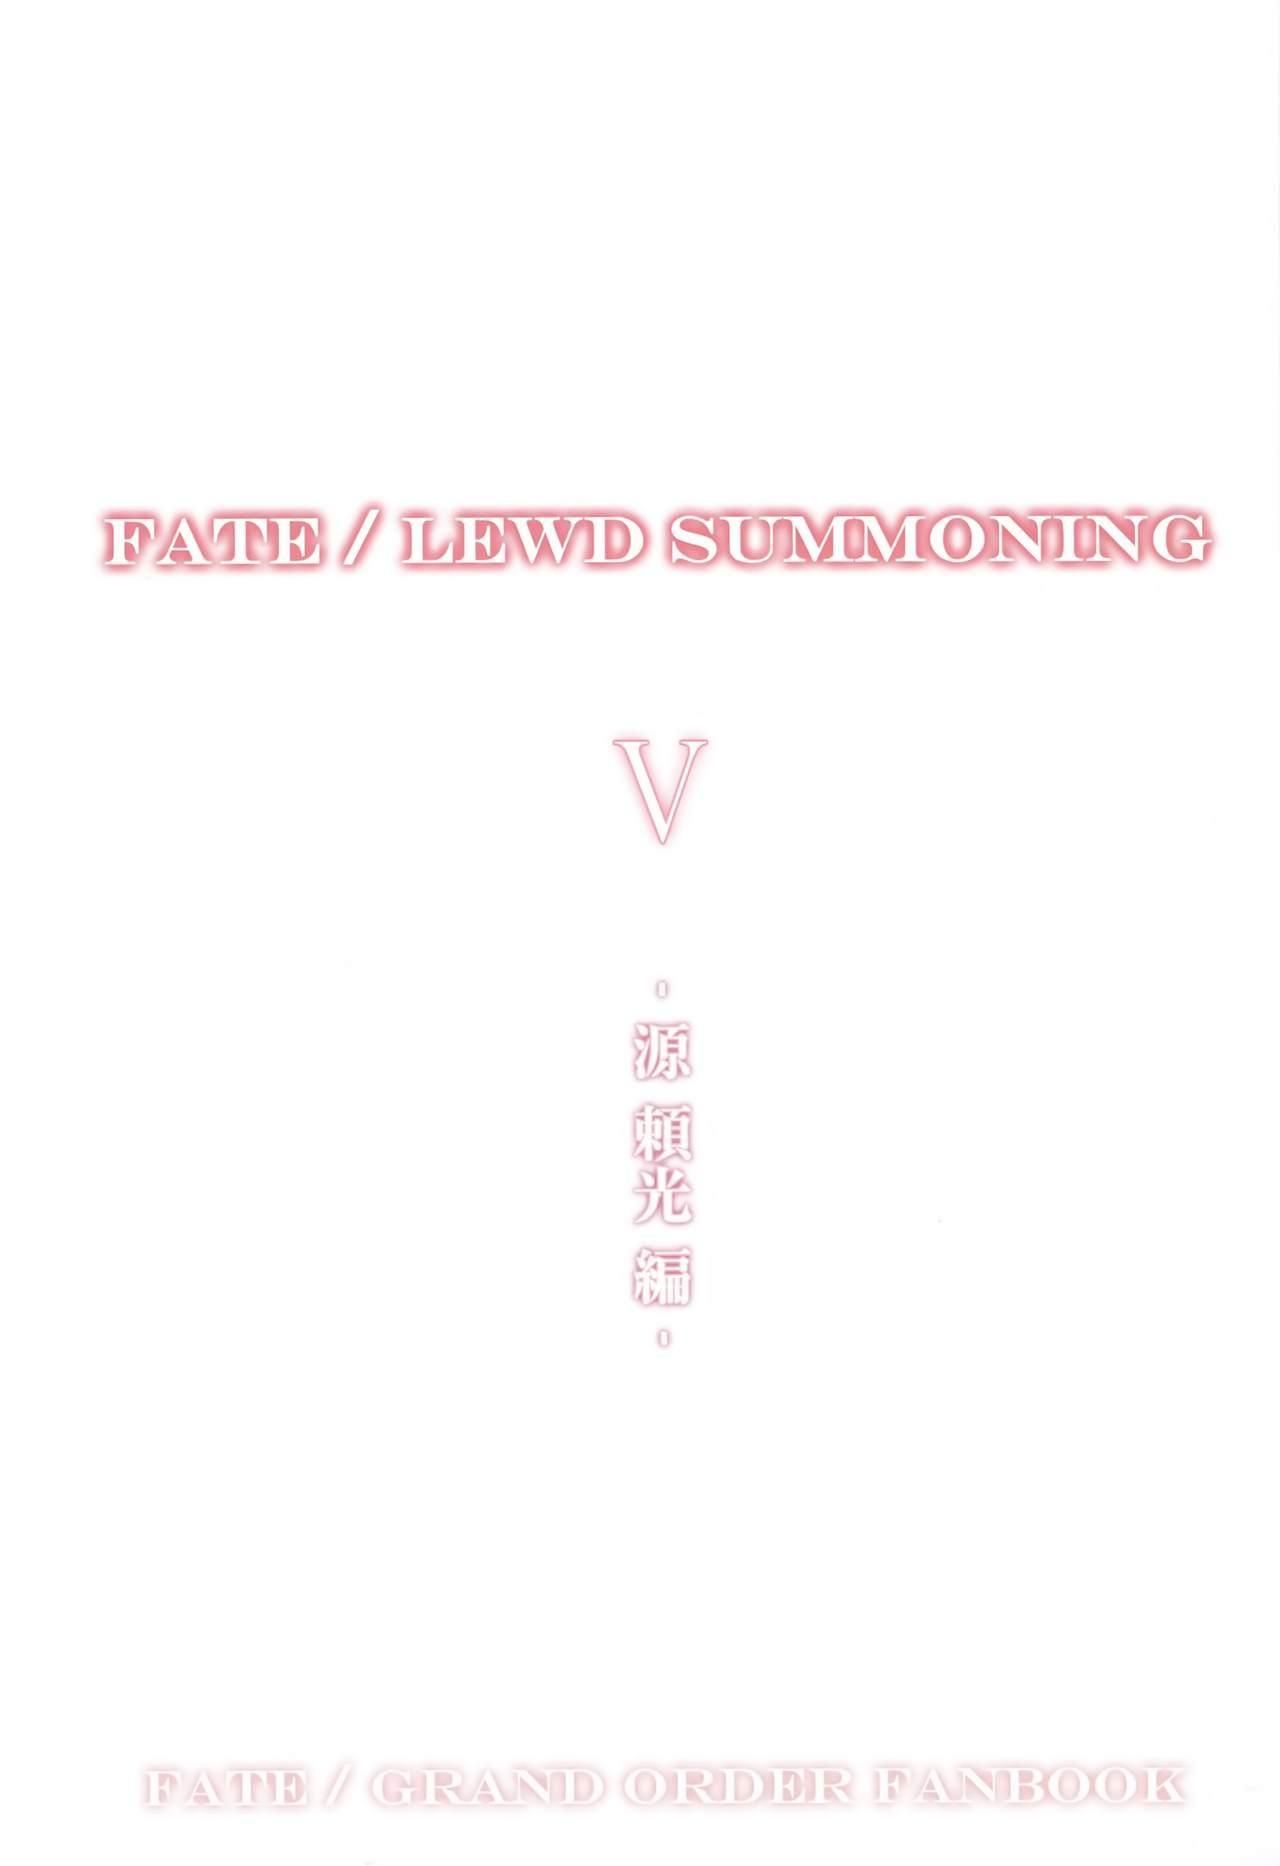 Fate/Lewd Summoning 5 1